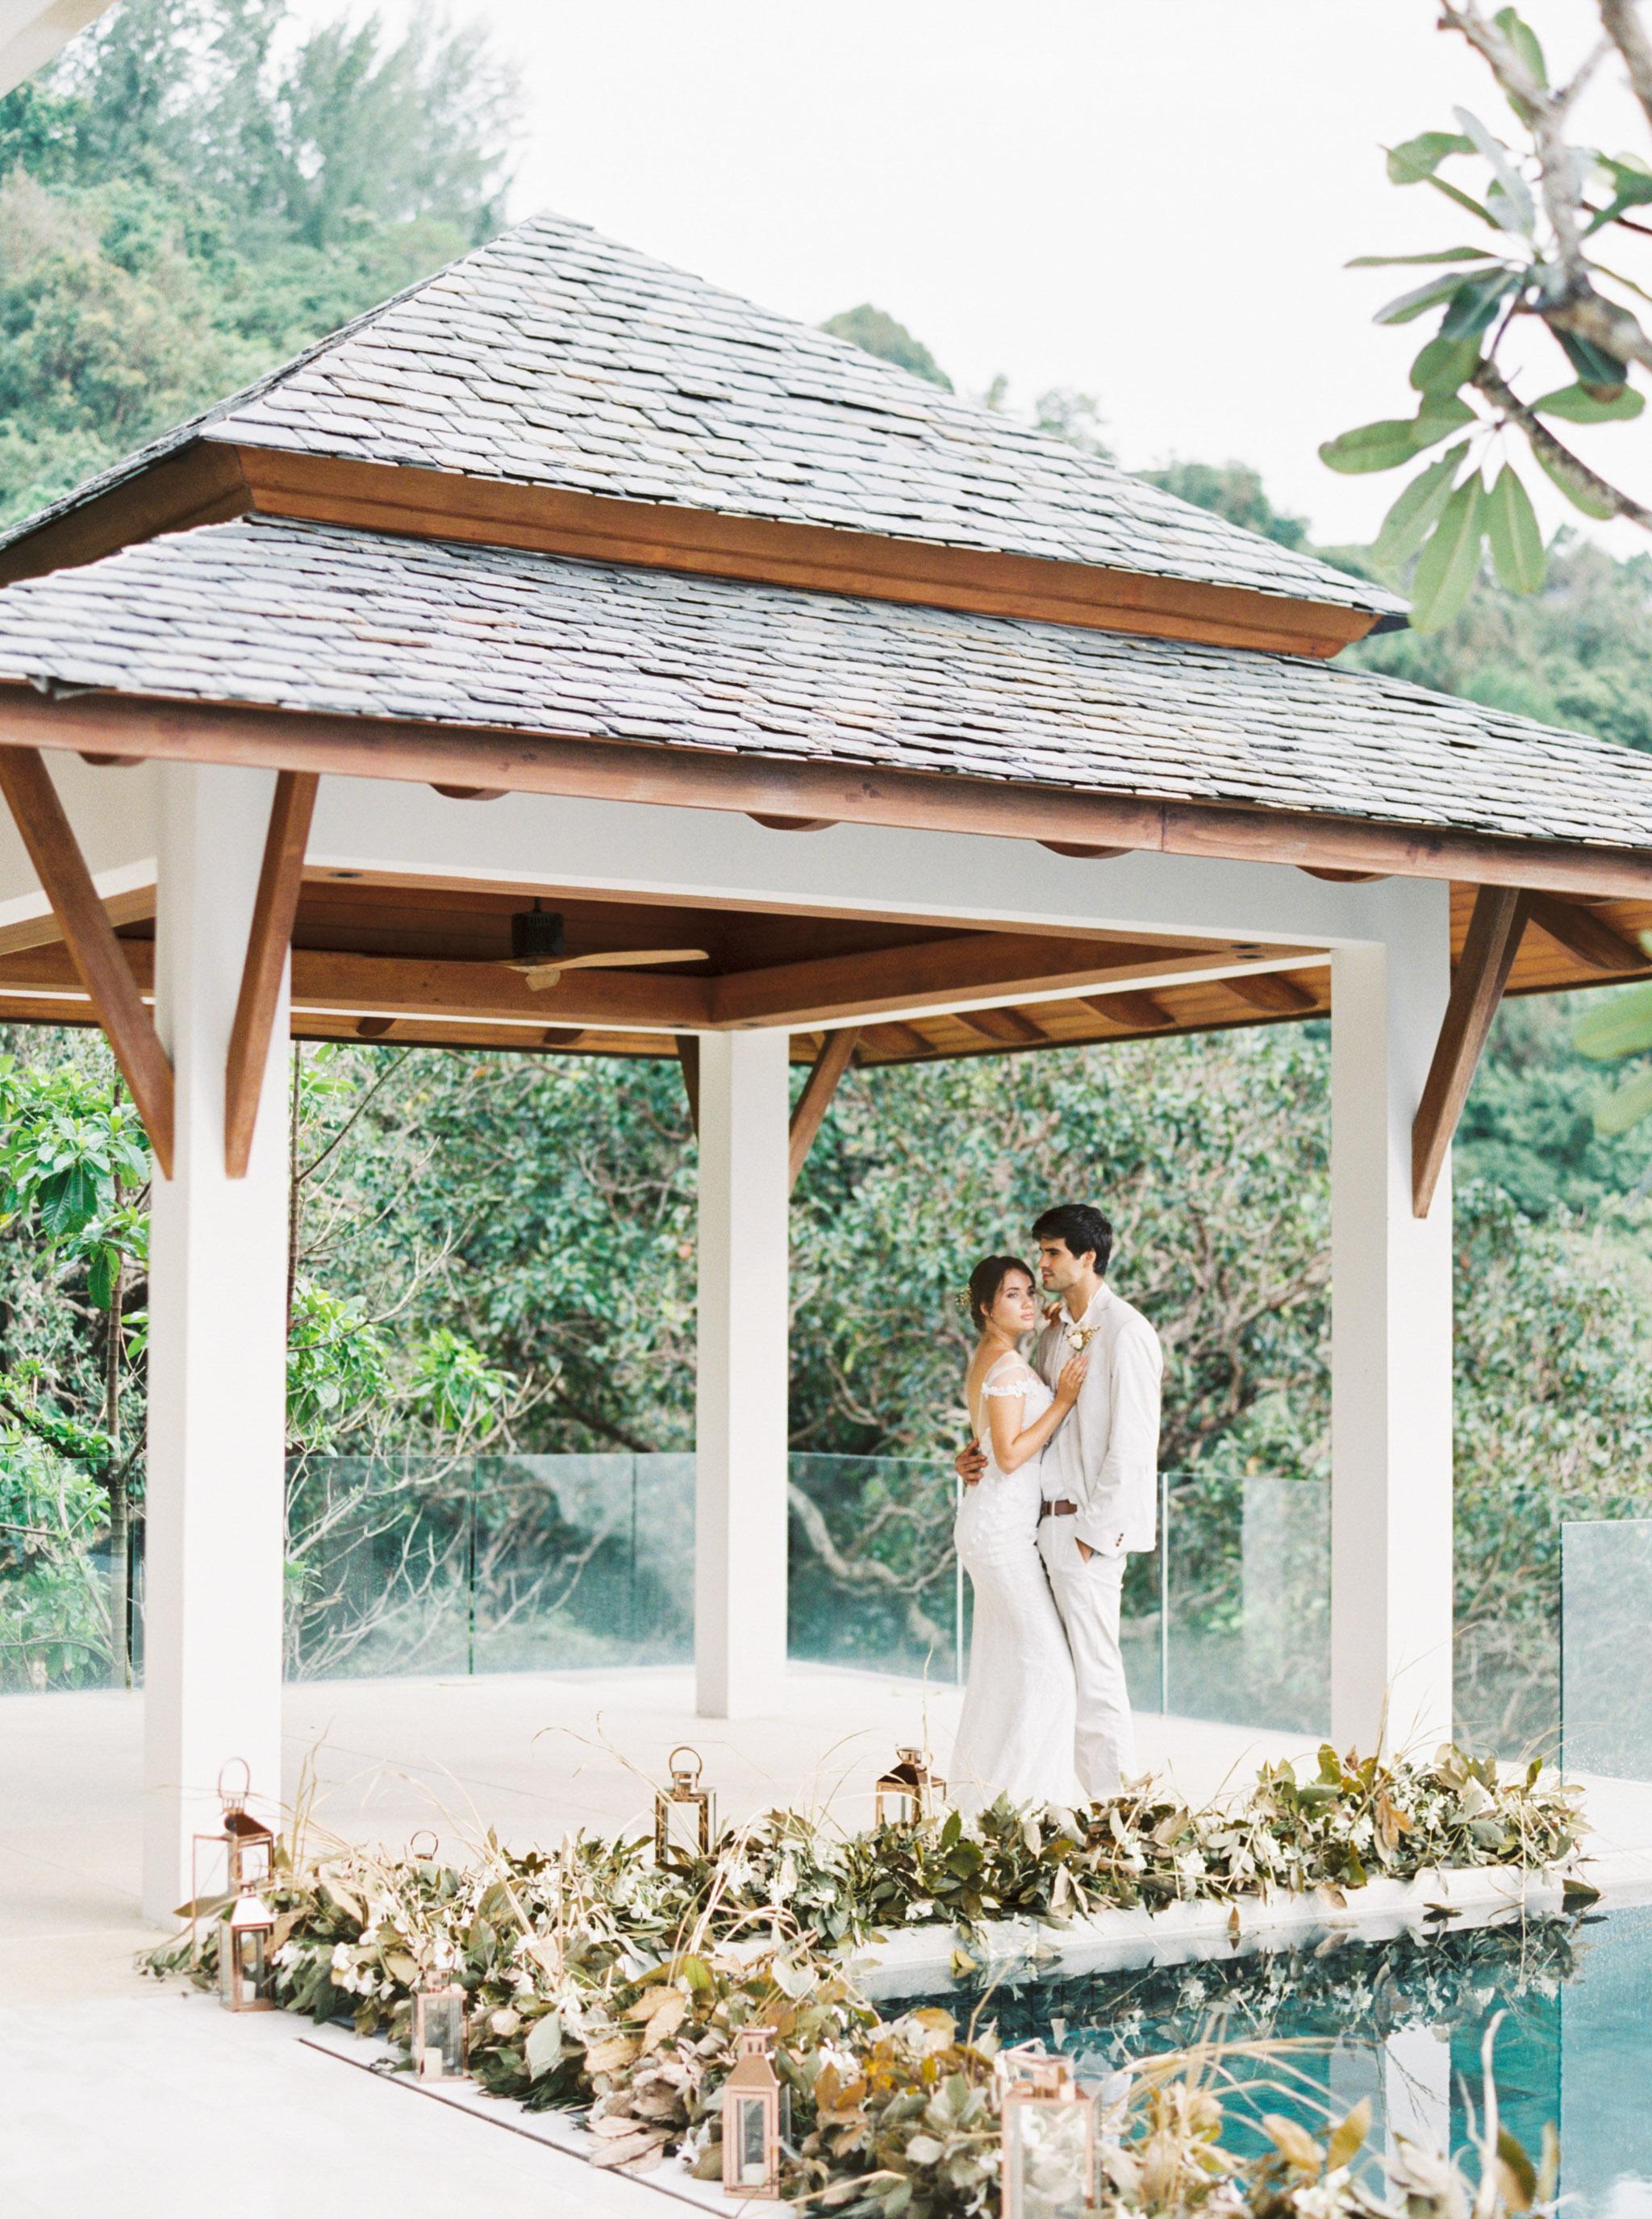 Destination Wedding Phuket Thailand Fine Art Film Photographer Sheri McMahon-00080-80.jpg